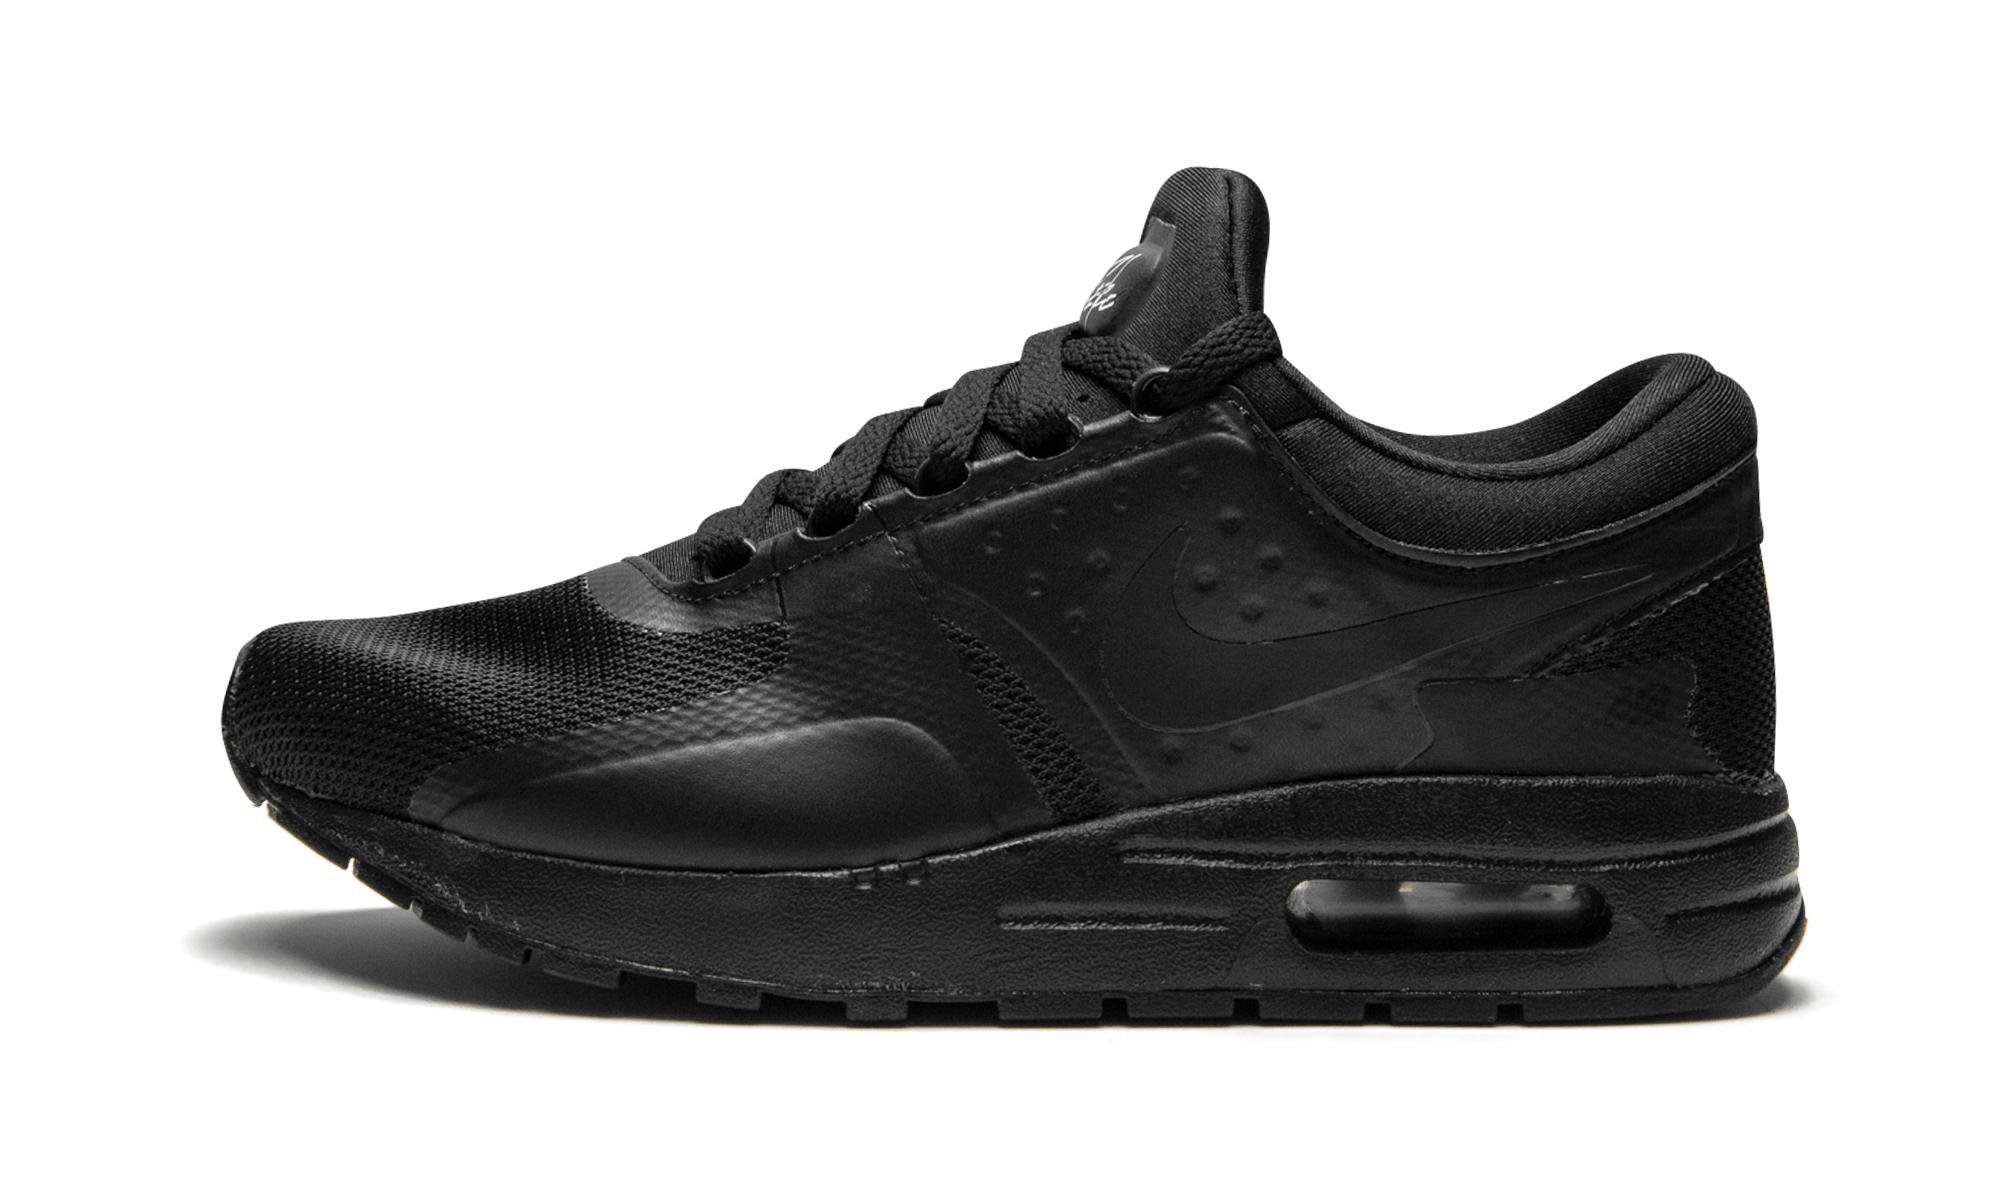 b61092072b Lyst - Nike Air Max Zero Essential Gs in Black for Men